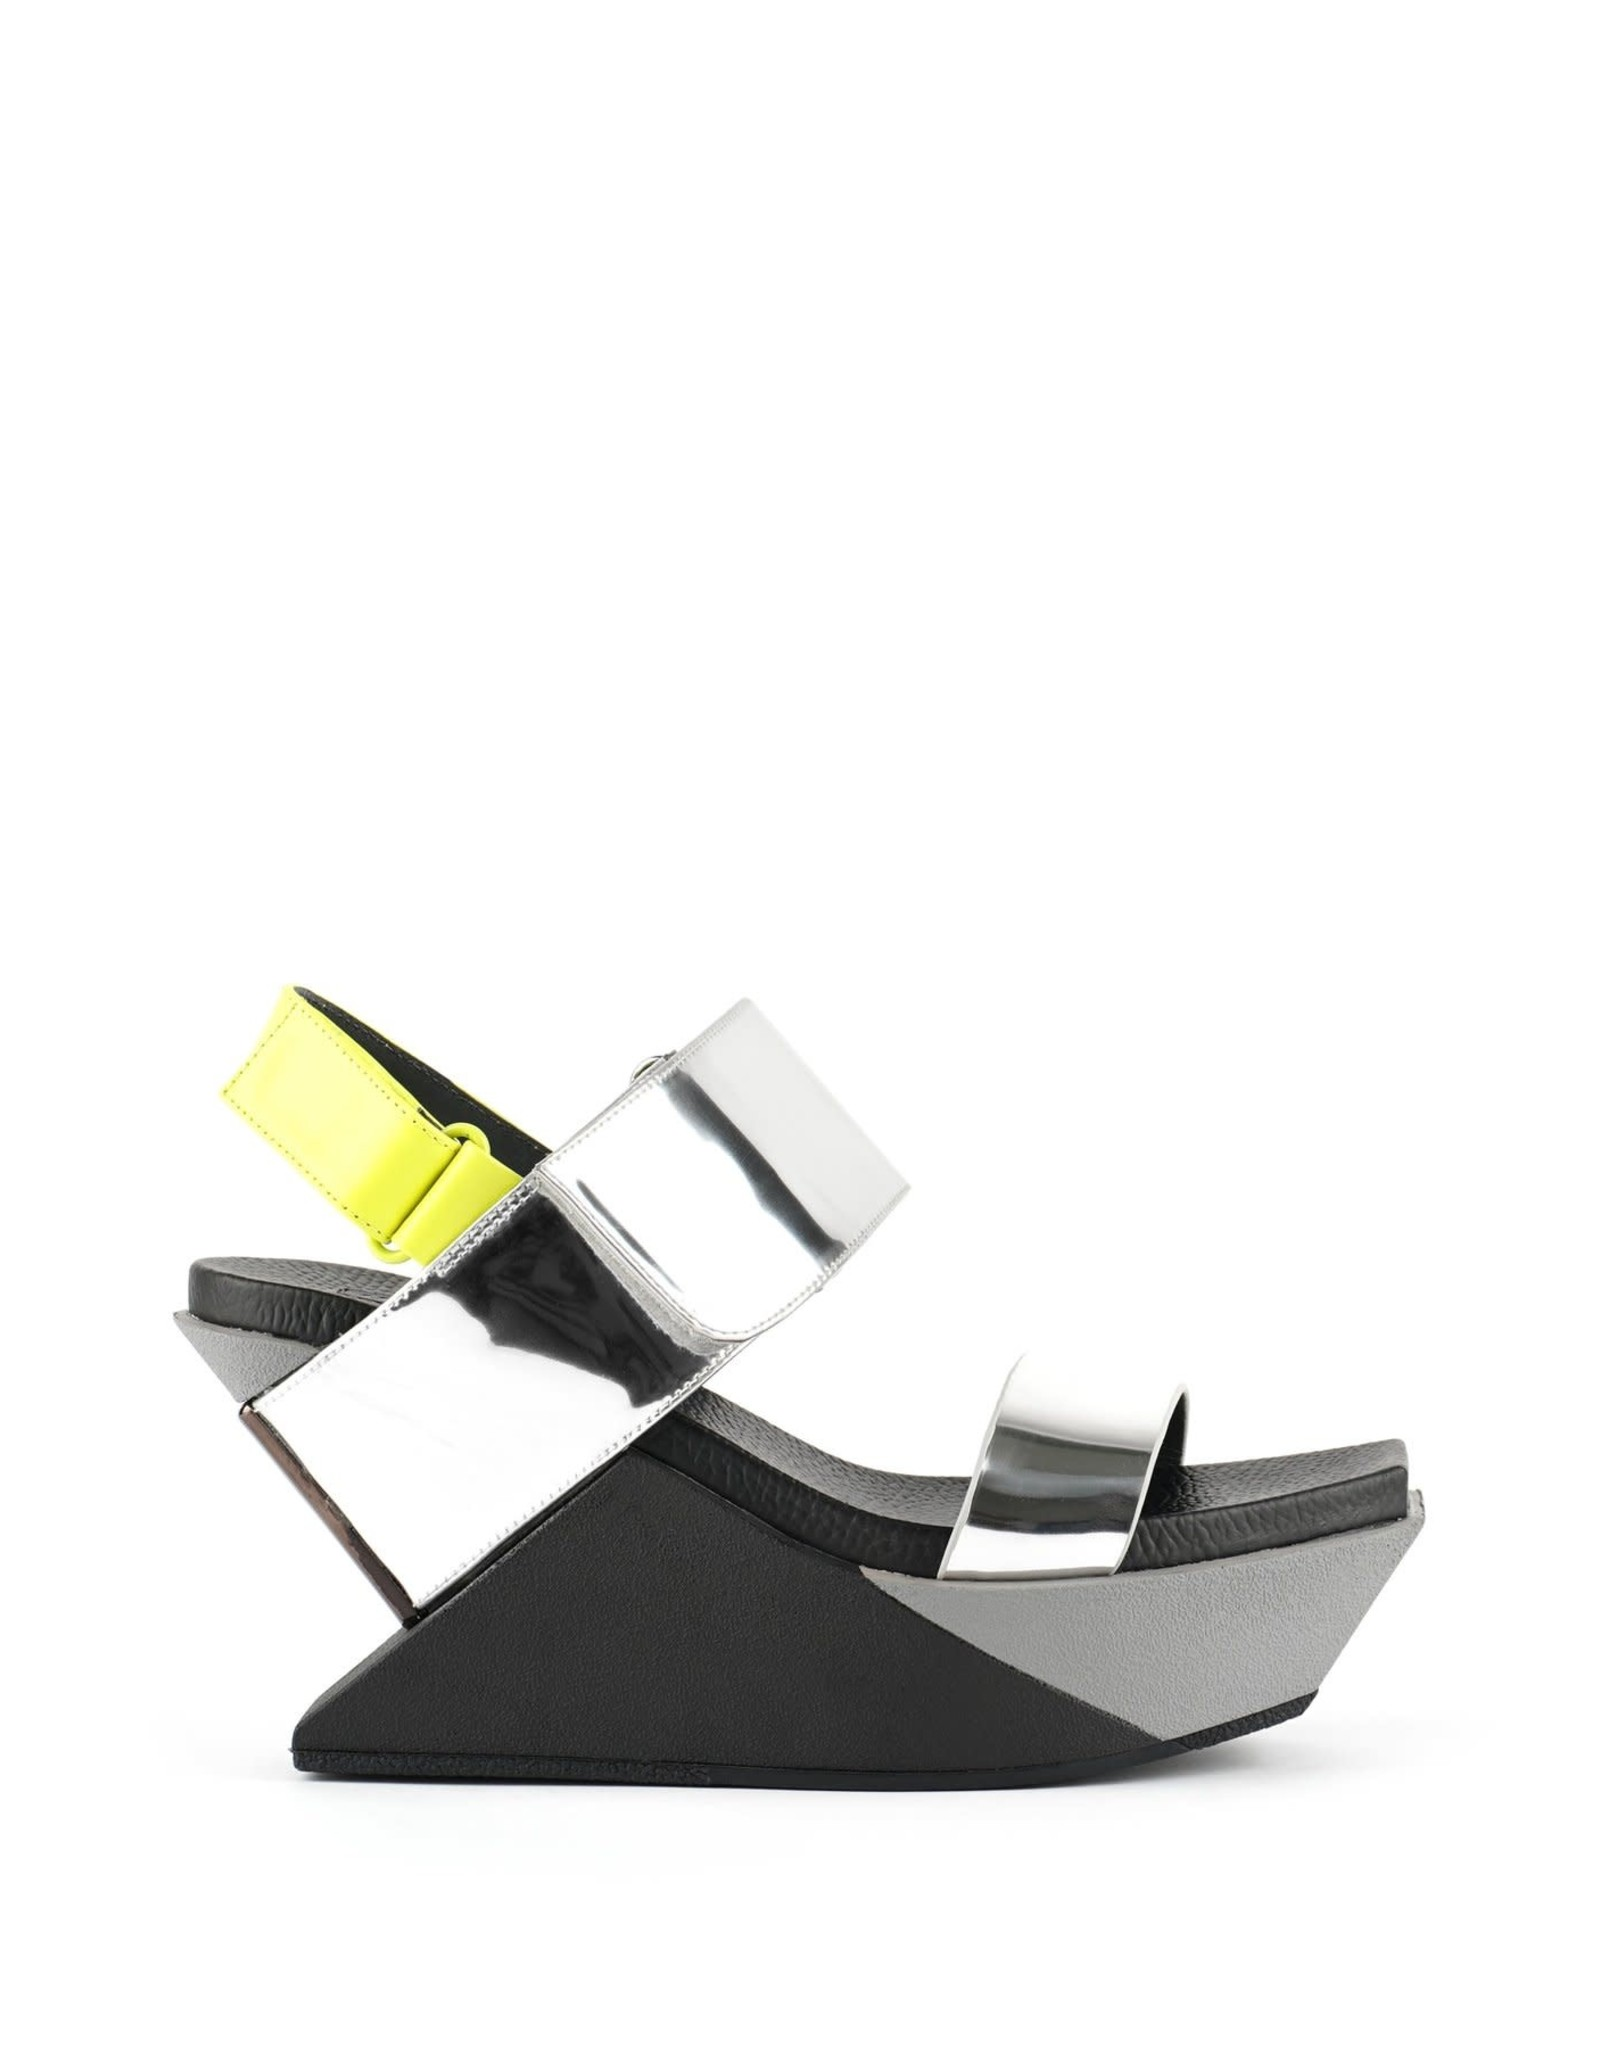 UNITED NUDE Delta Wedge Sandal